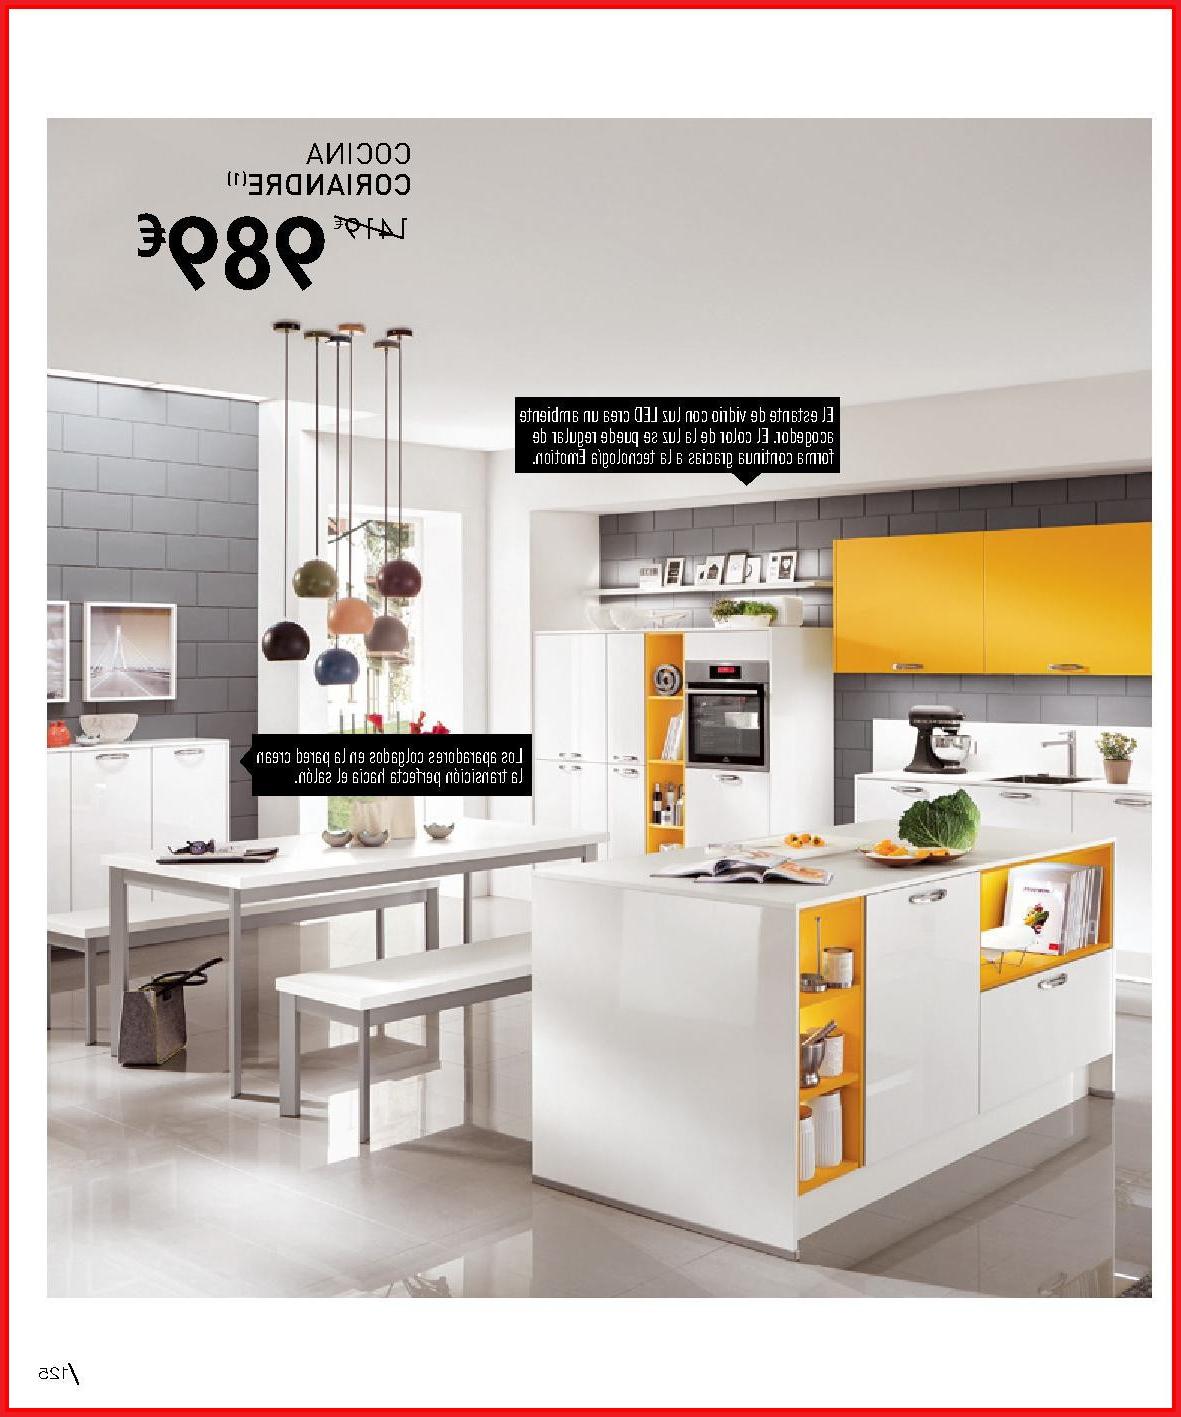 Catalogo Muebles De Cocina Jxdu Decorablog Revista De Decoracià N ...